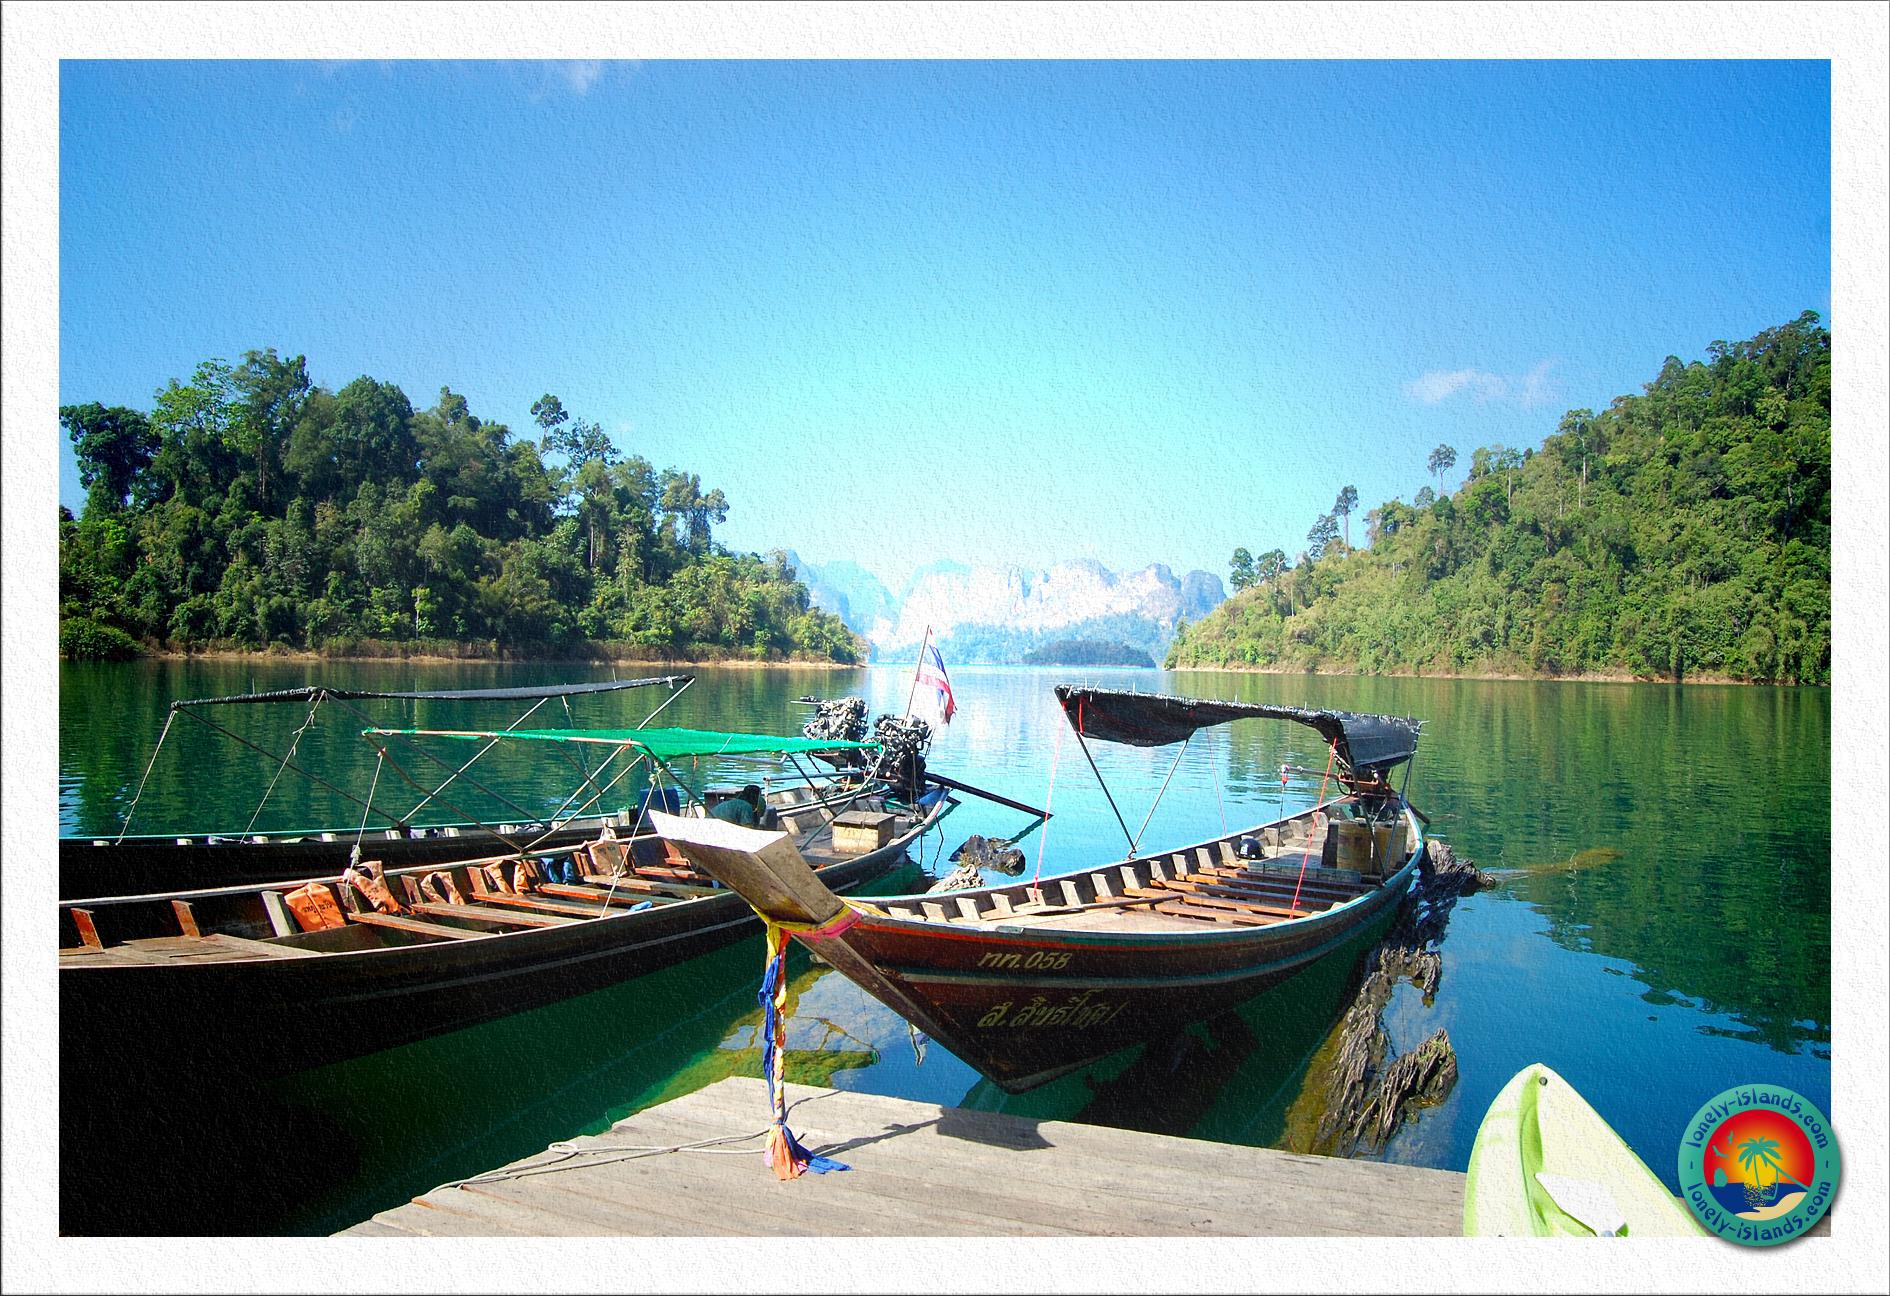 Longtailboote auf dem Chiao Lan Stausee